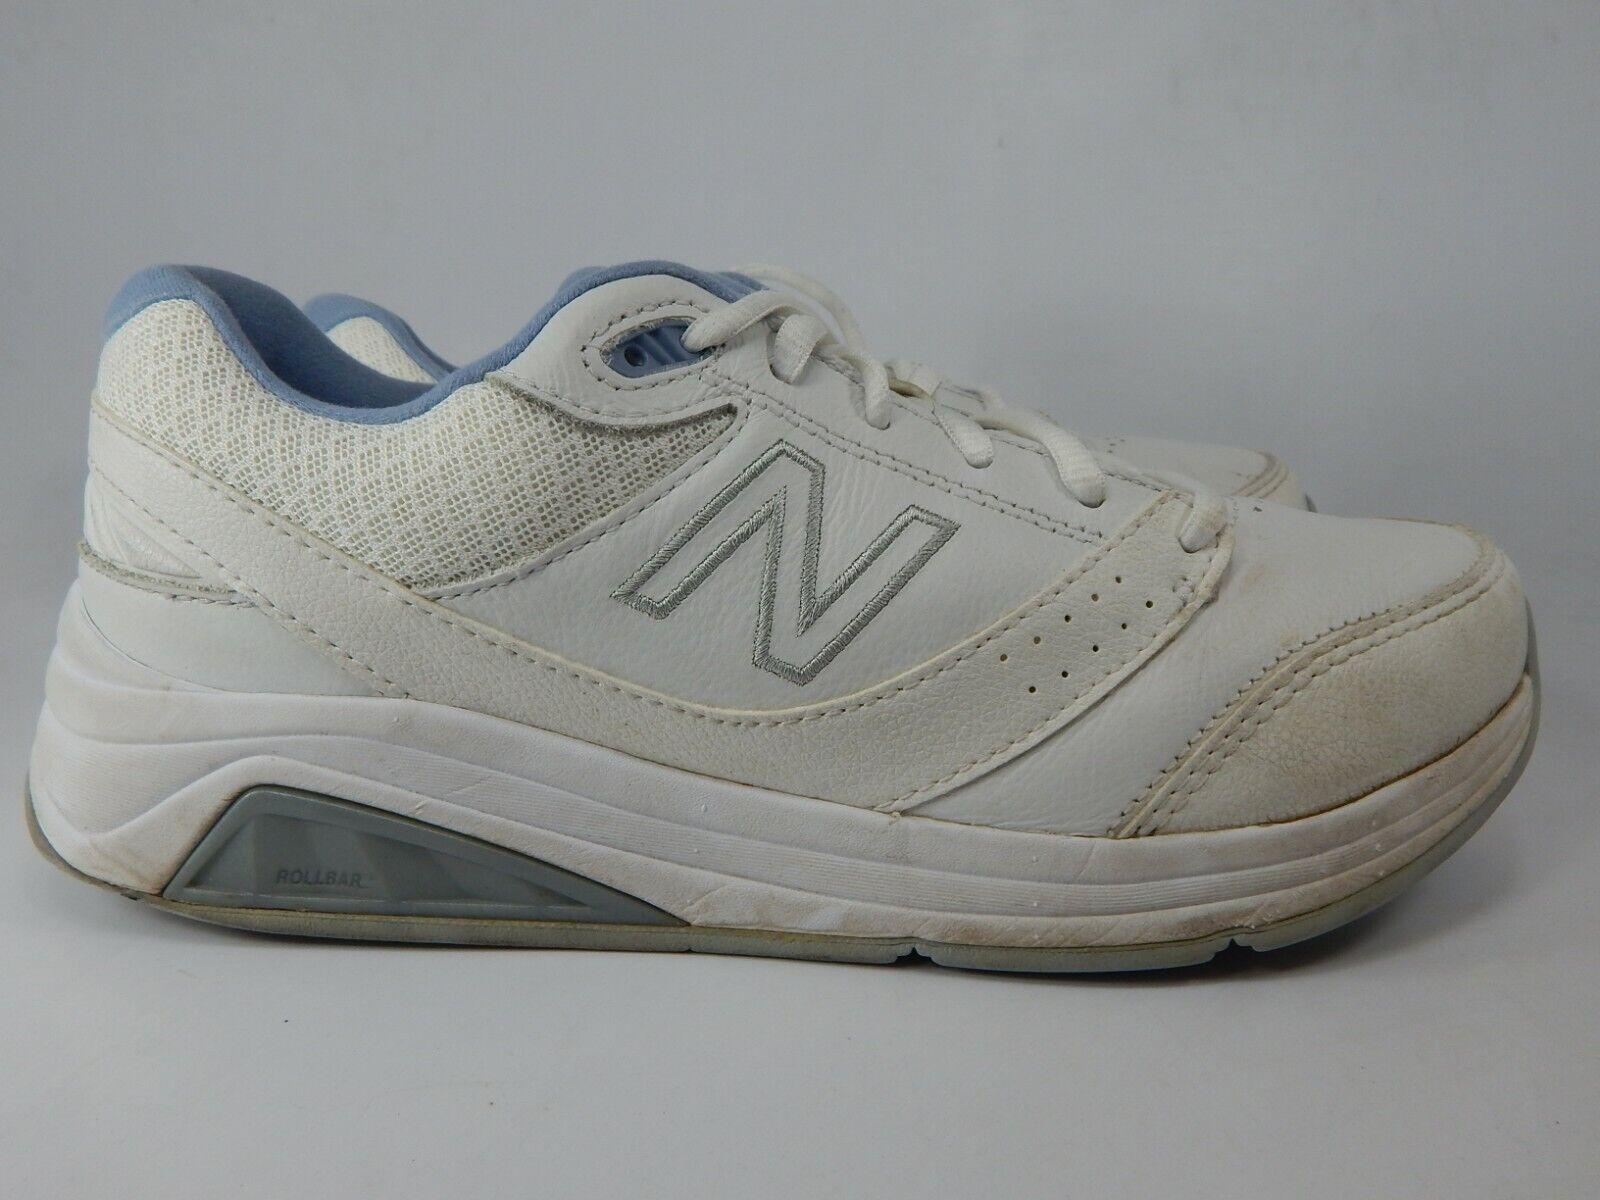 New Balance 928 v3 Talla US 7.5 M (B) Eu 38 Mujer Caminar Zapatos blancoo